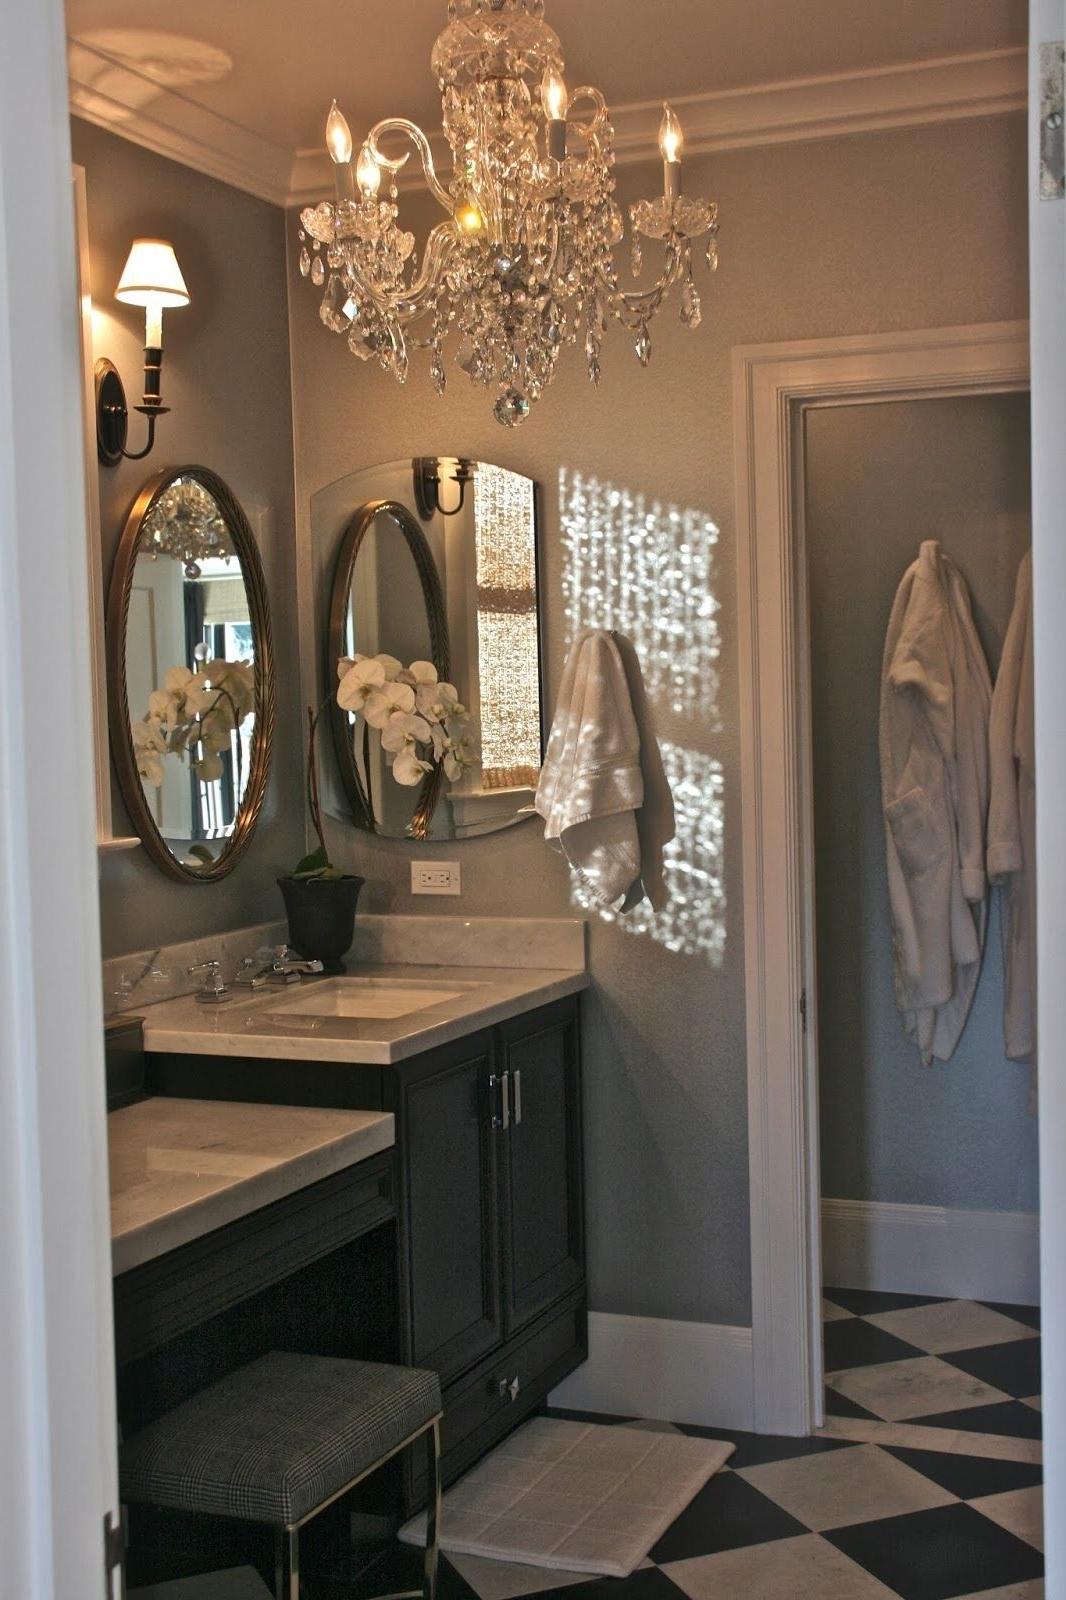 Chandelier Bathroom Lighting For Current Elegant Retreat. .  (View 3 of 20)